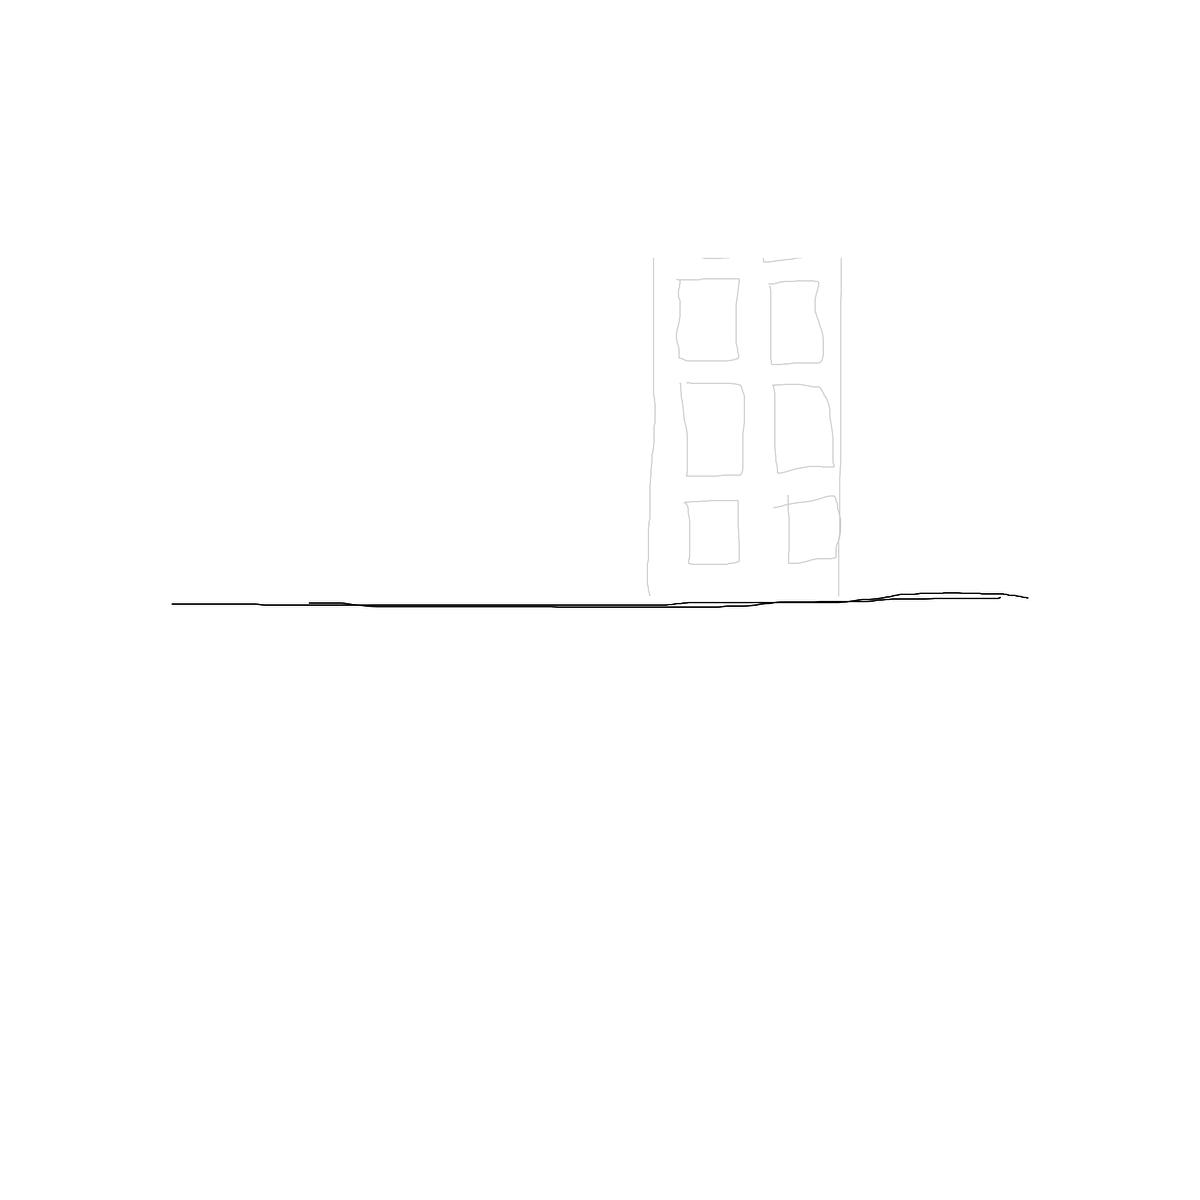 BAAAM drawing#15131 lat:-32.2596168518066400lng: 148.6463317871093800